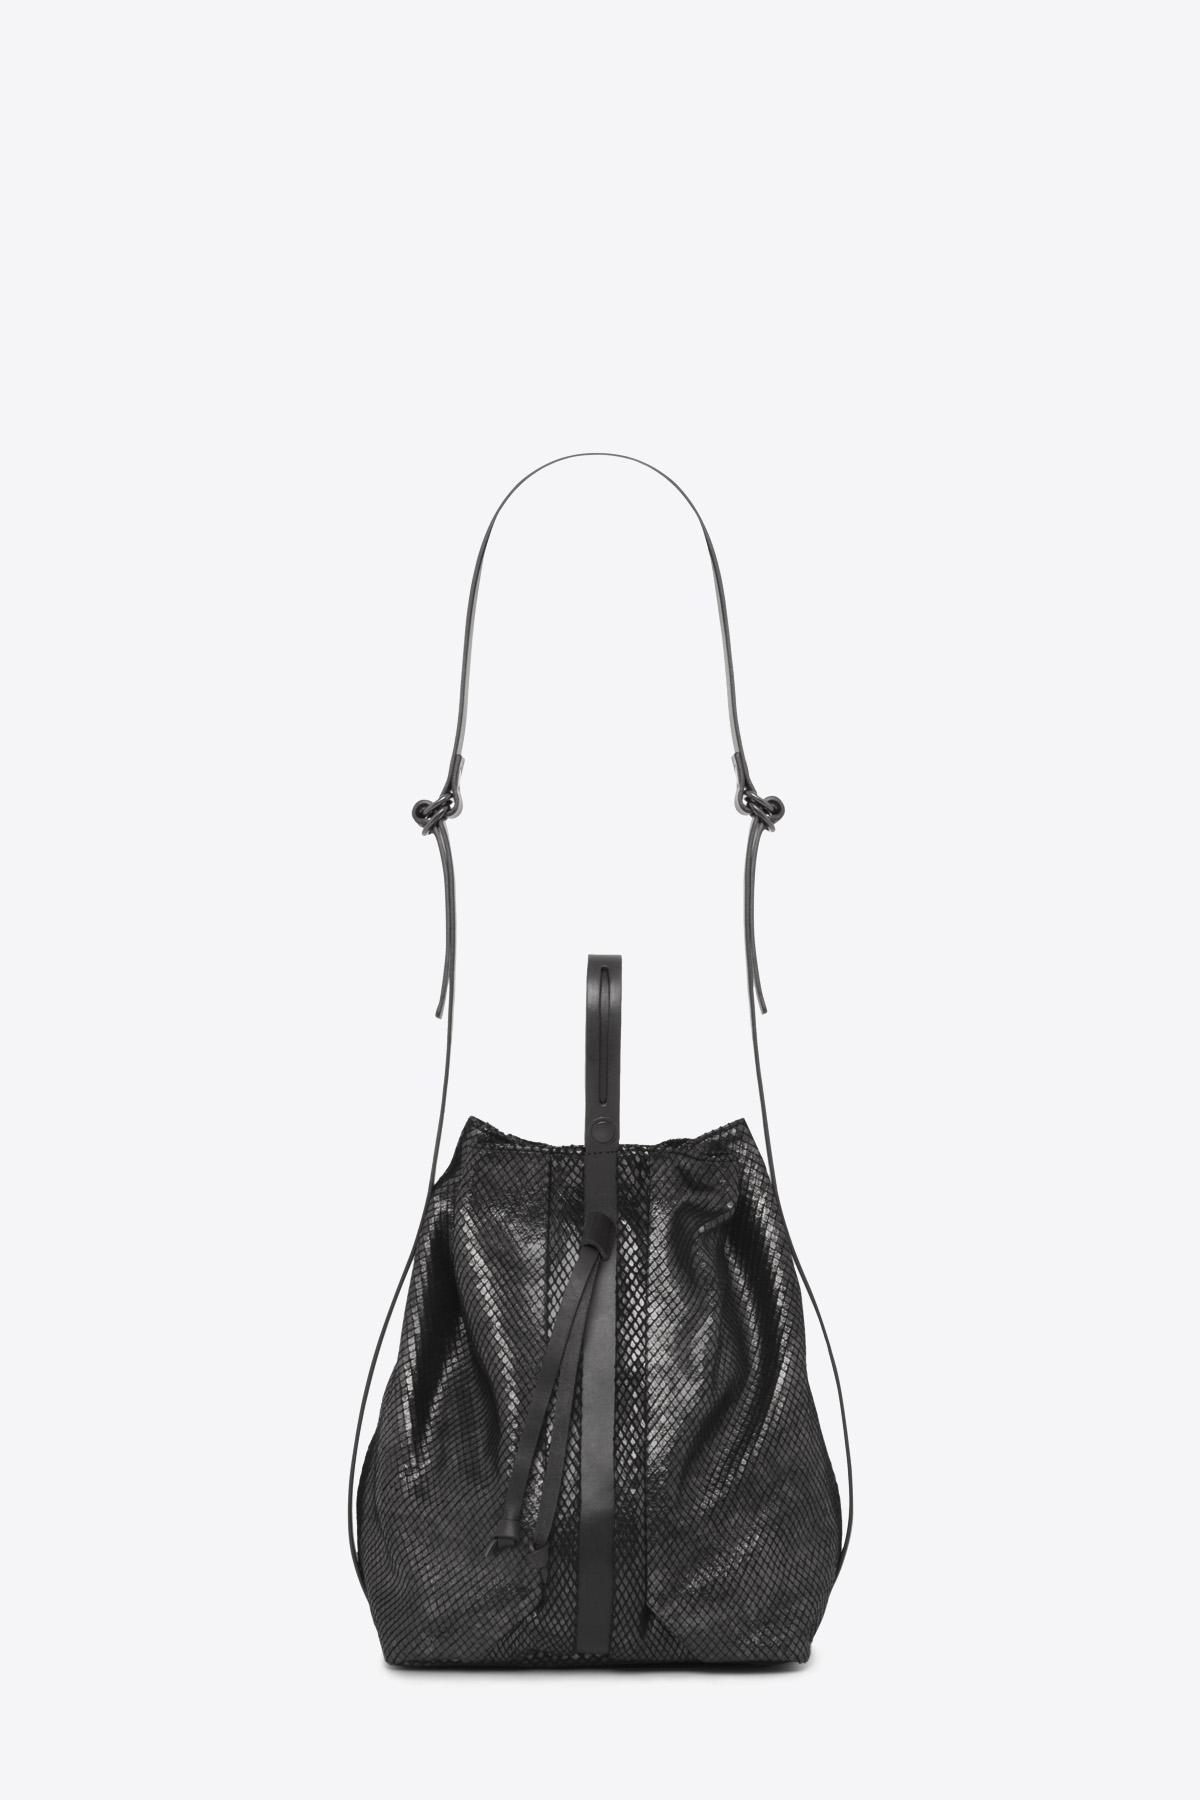 dclr010-bucketbag-a23-backsnakeblack-front